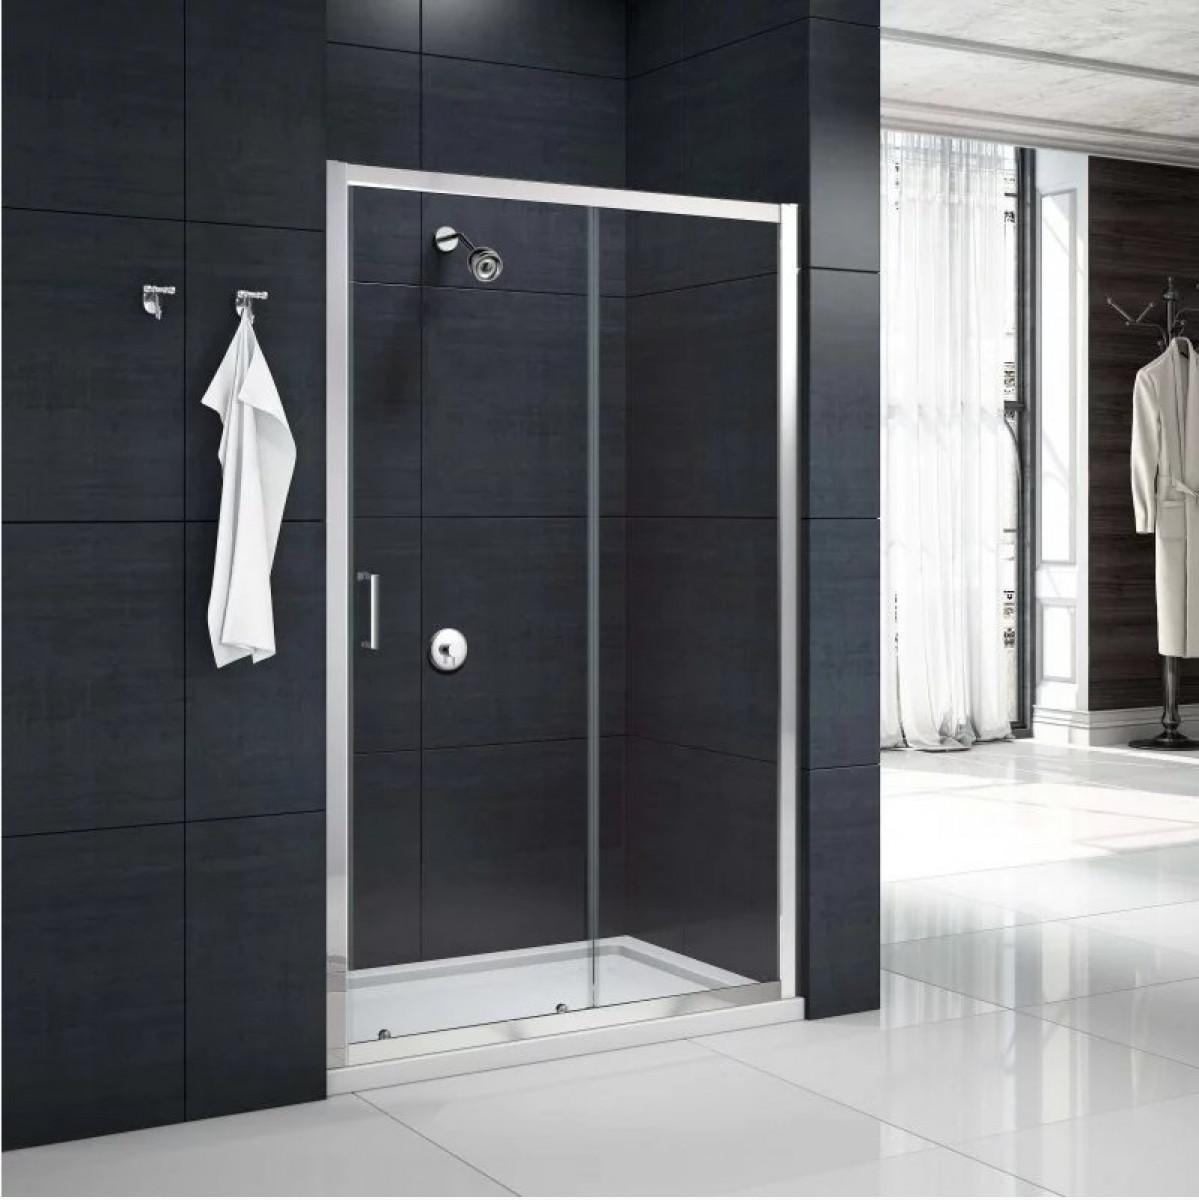 Merlyn M Box 1200mm Sliding Shower Door & Merlyn MBox Sliding Shower Door 1200mm | MBS1200 -